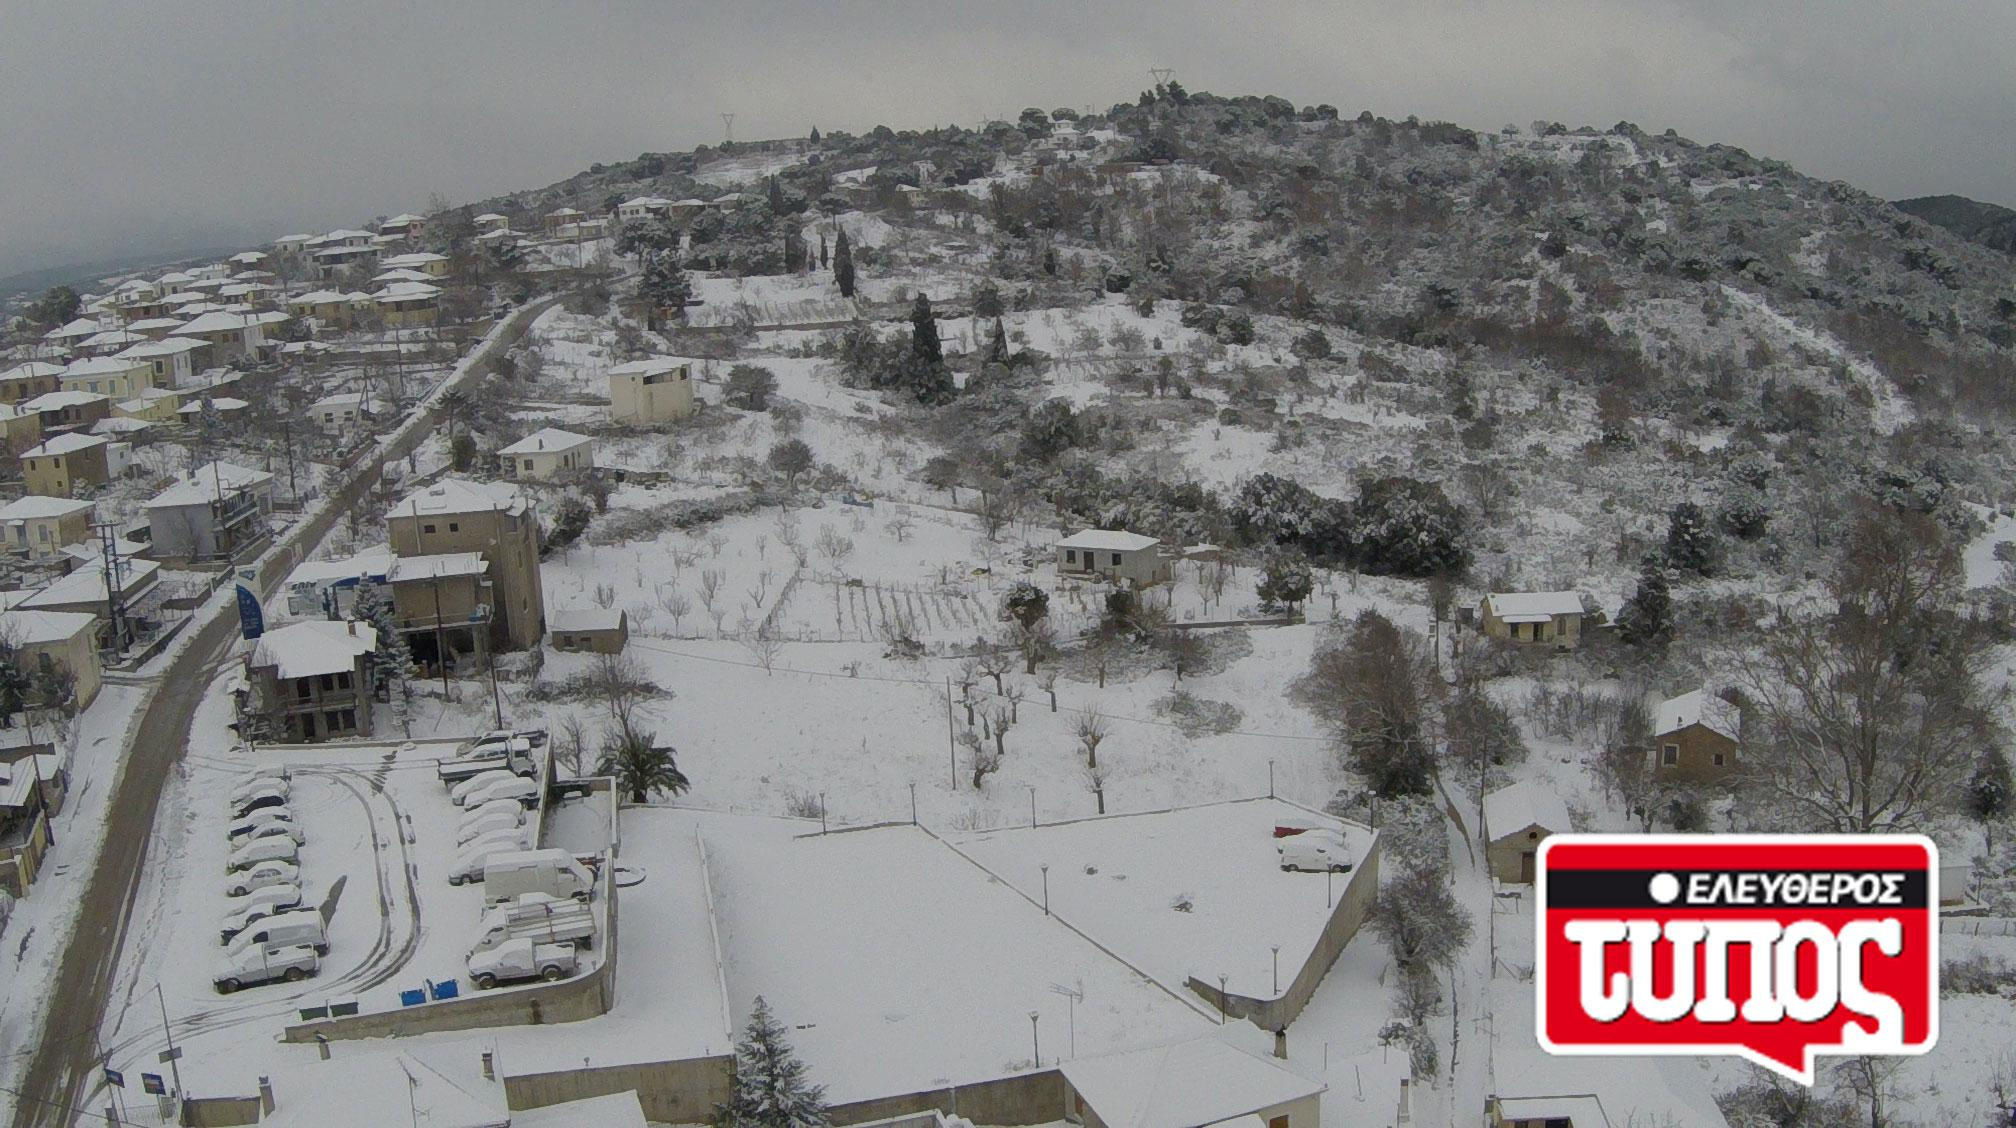 laukos-piliou-xionismenos-aerofotografies-1300-5 Εντυπωσιακές αεροφωτογραφίες από το χιονισμένο Λαύκο Πηλίου [εικόνες]